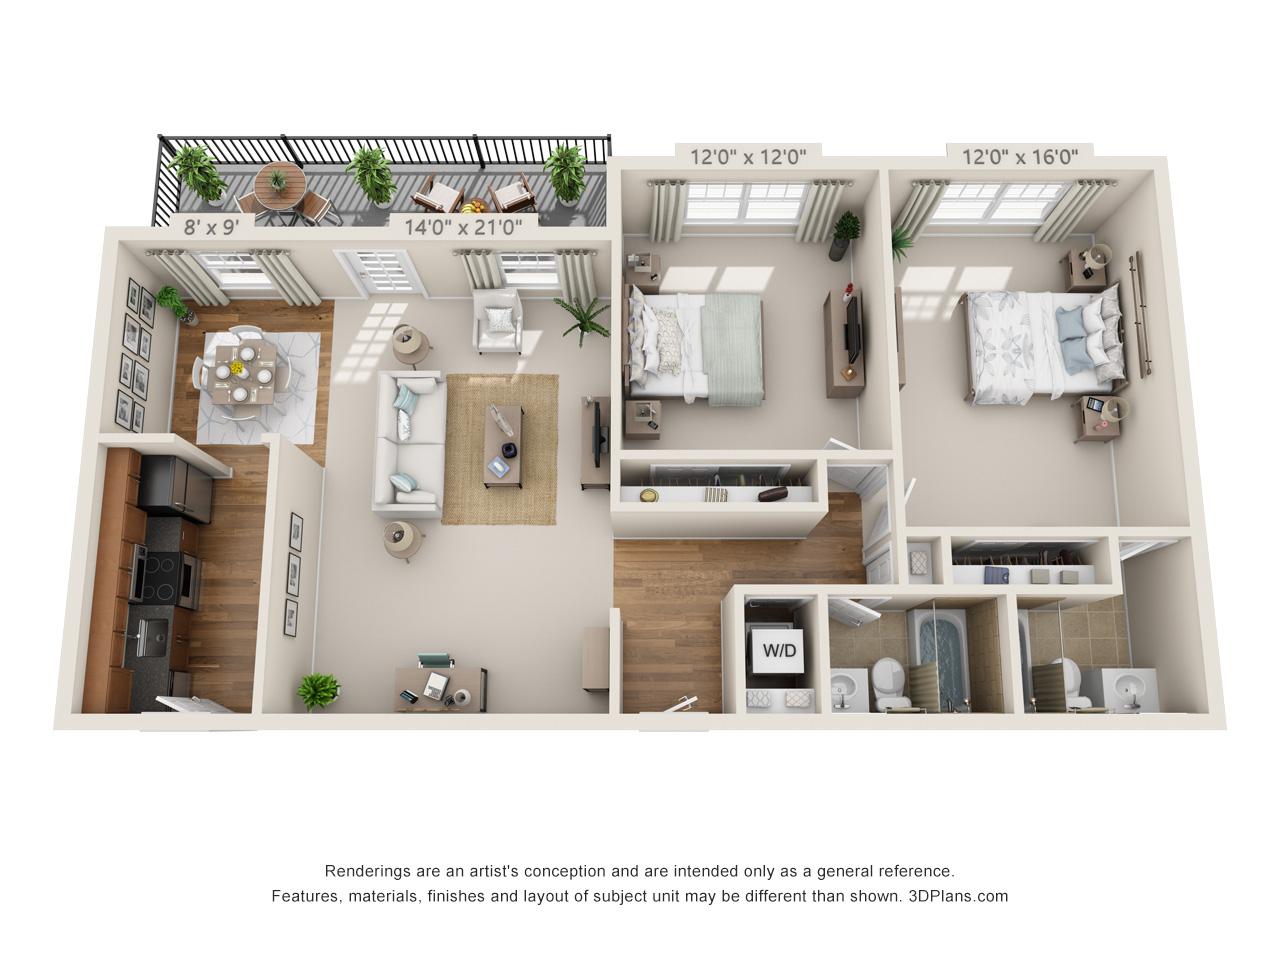 2 bedroom apartment in horsham pa